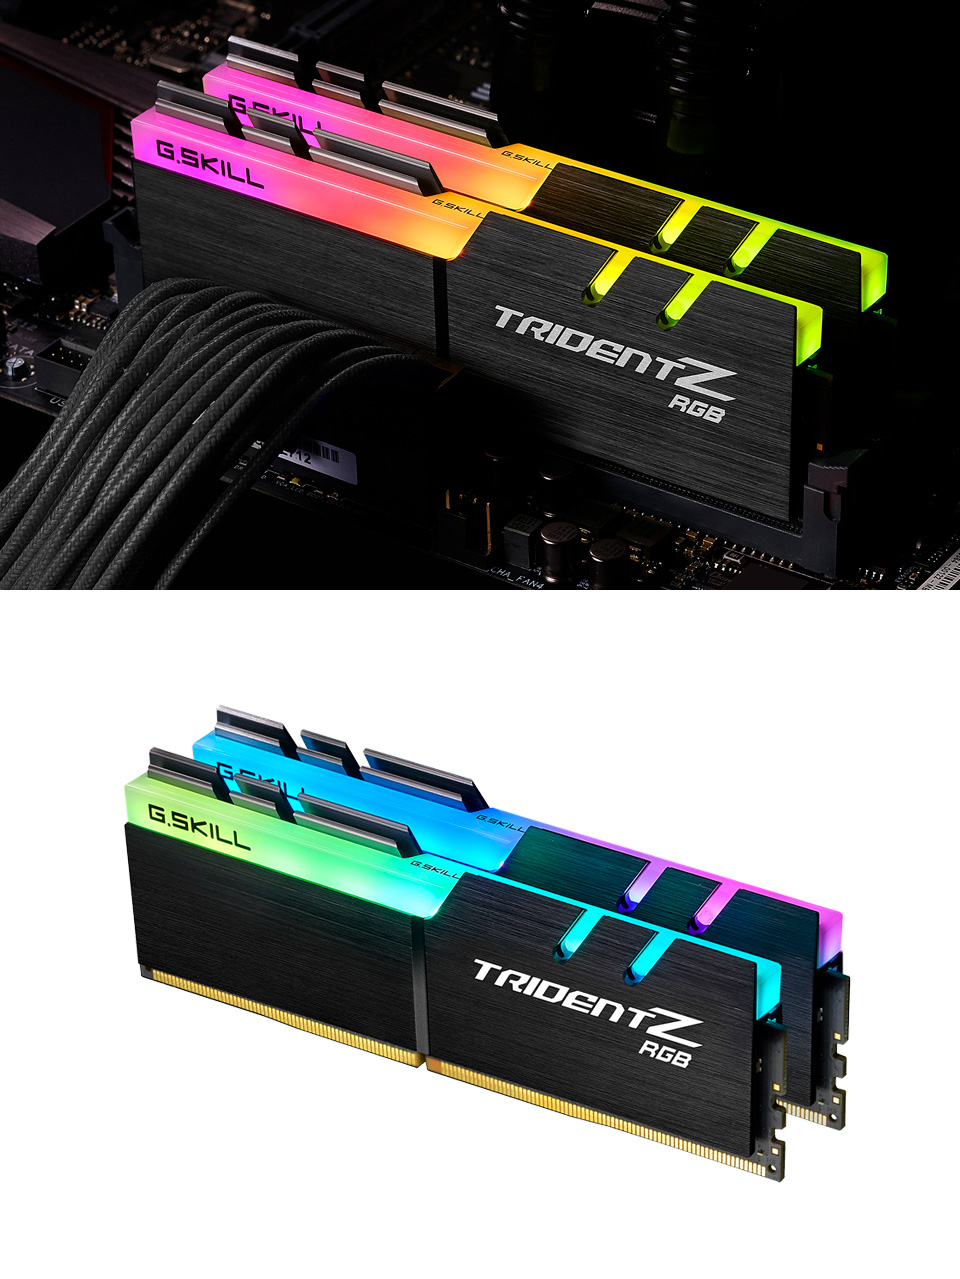 G.Skill Trident Z RGB F4-3600C18D-32GTZR 32GB (2x16GB) DDR4 product